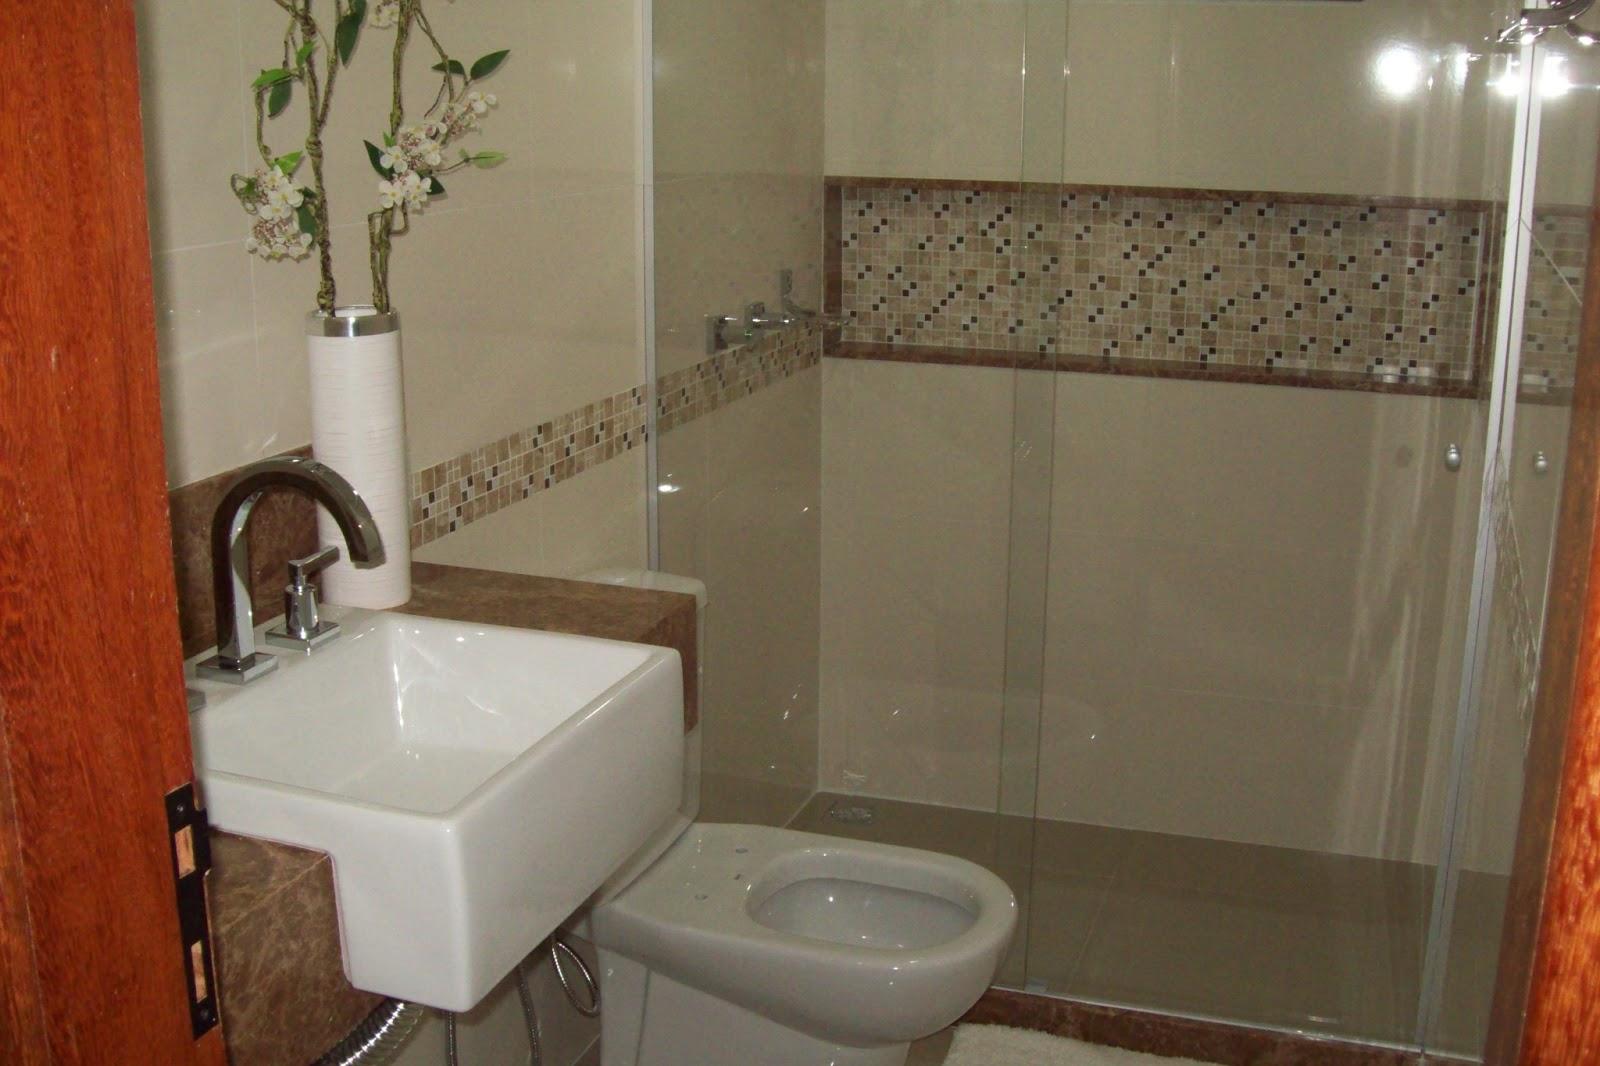 Nicho Banheiro Related Keywords & Suggestions Nicho Banheiro Long  #AE461D 1600x1066 Banheiro Com Nicho